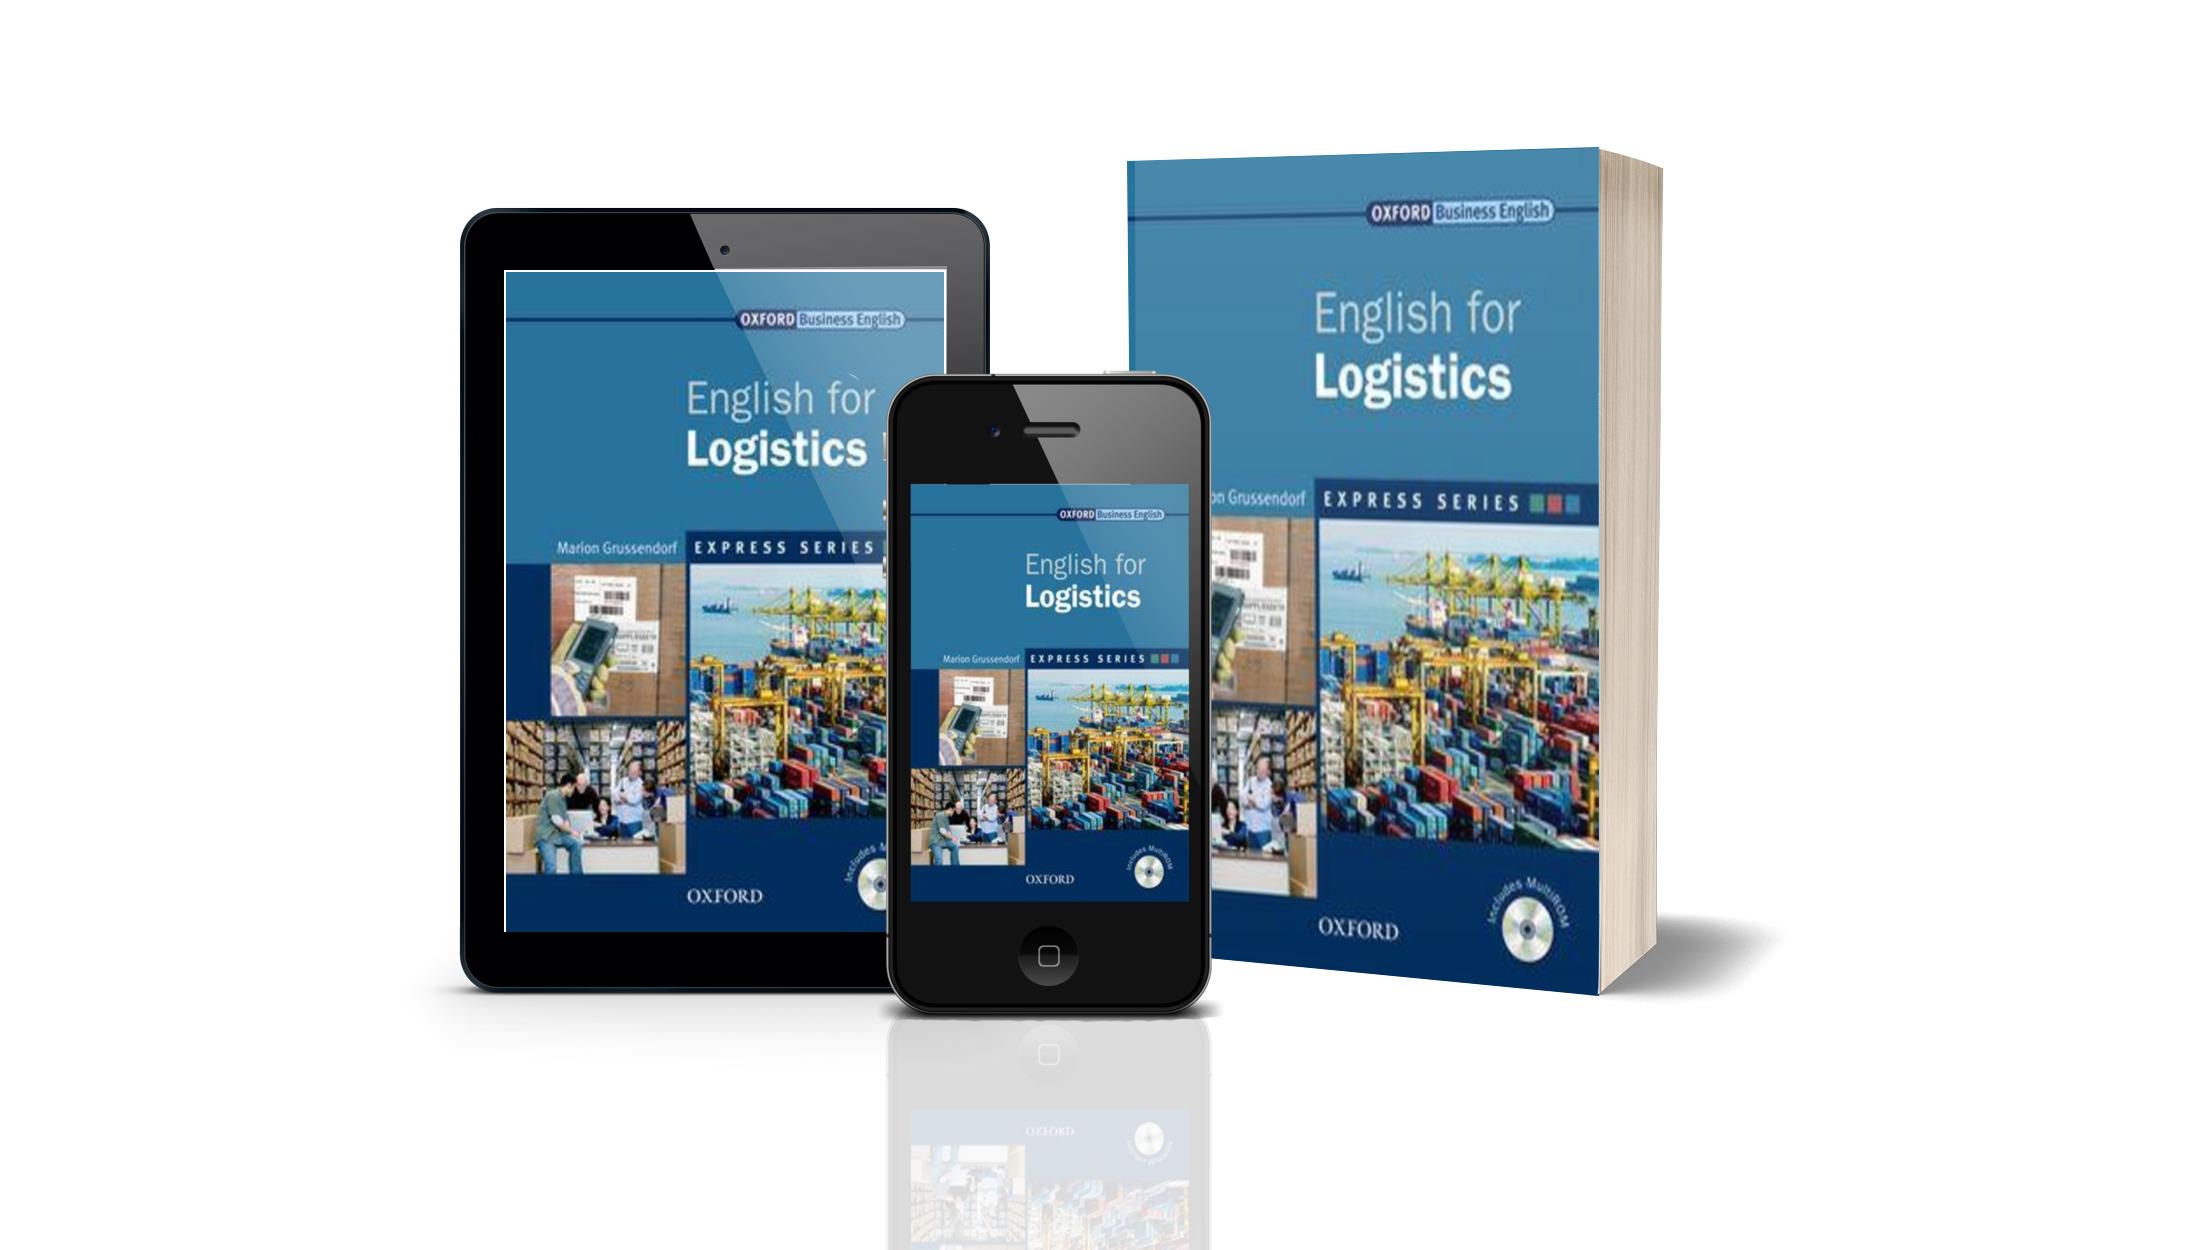 BOOK: ENGLISH FOR LOGISTICS- OXFORD